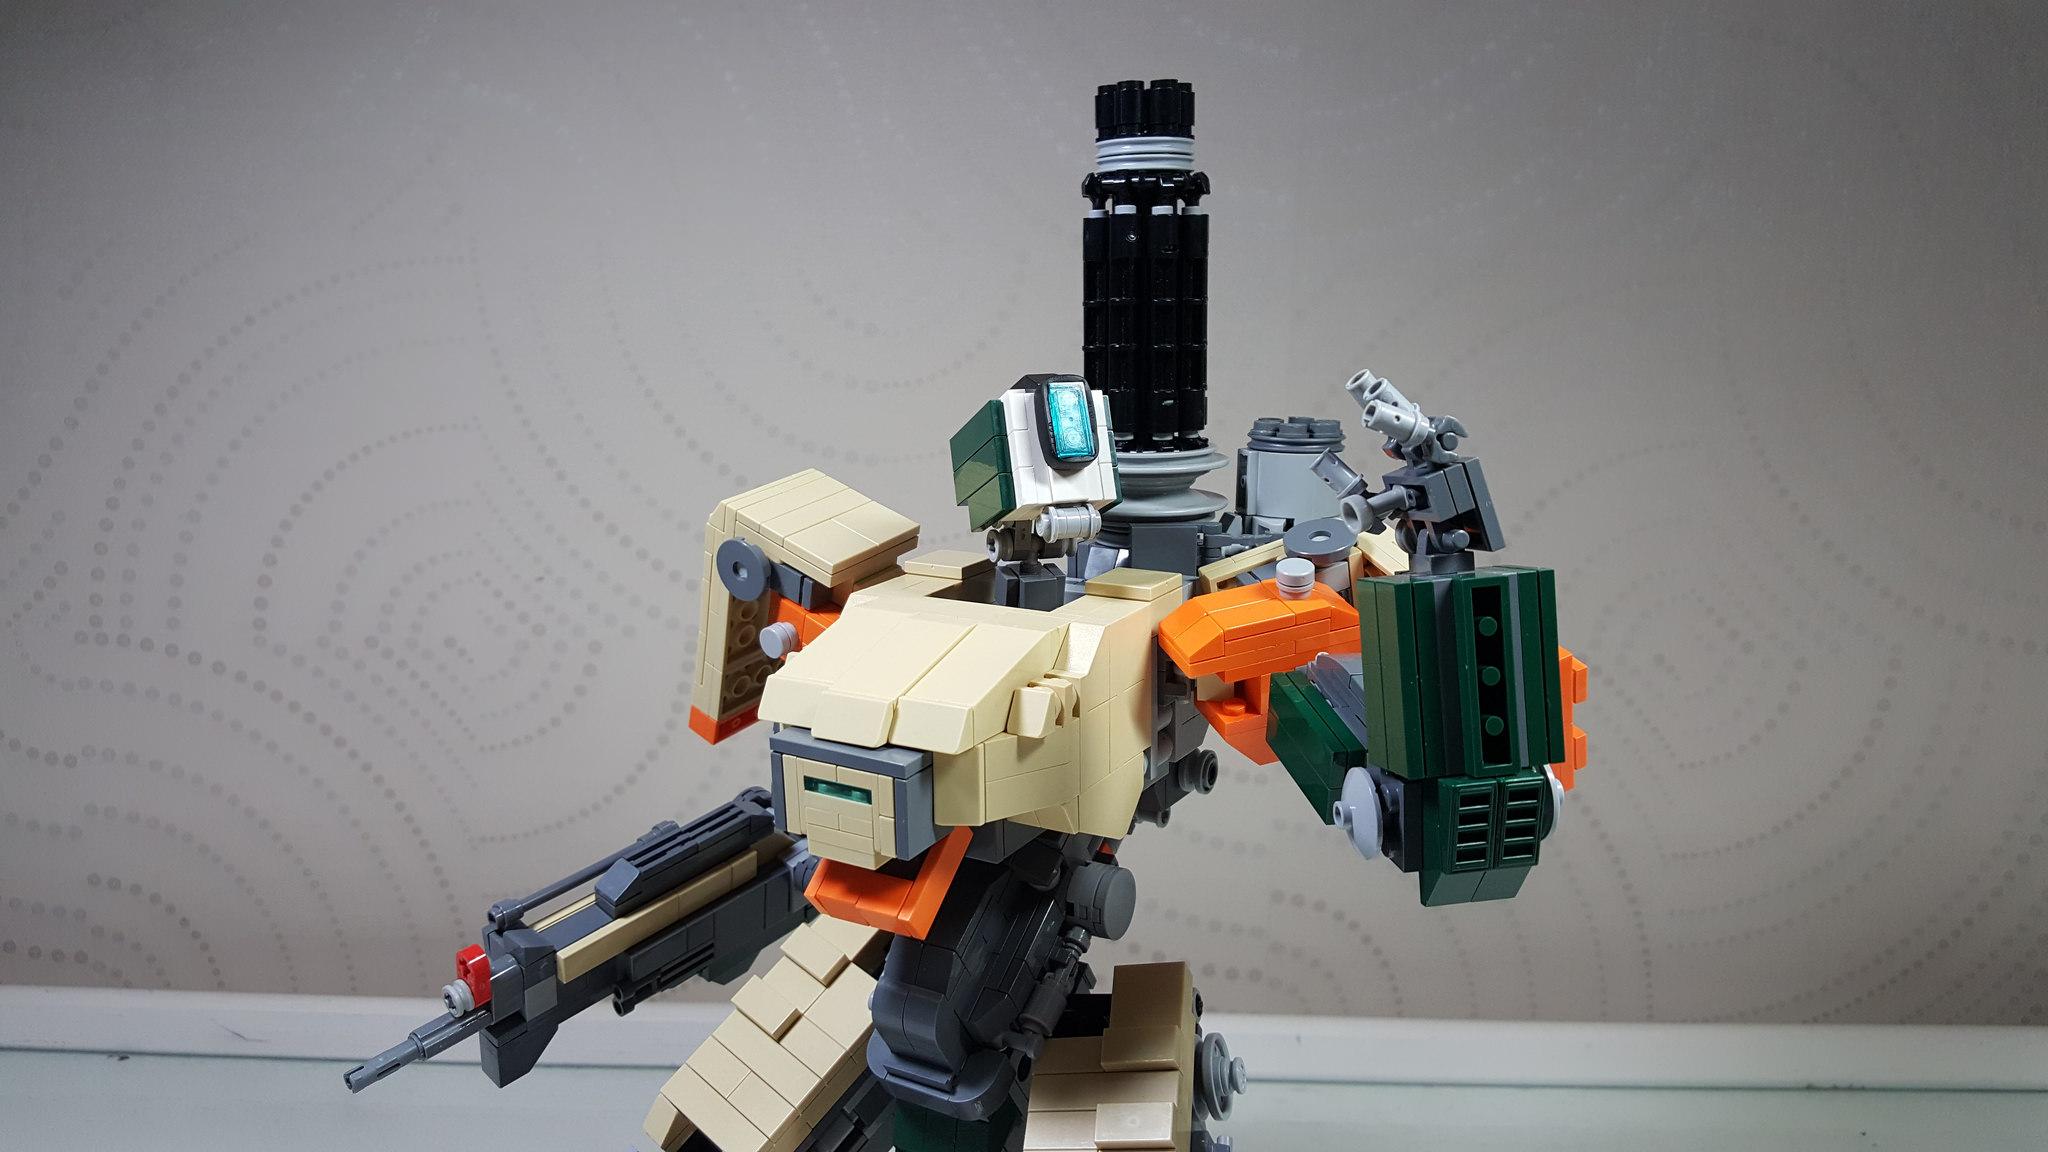 Genji Pc Build